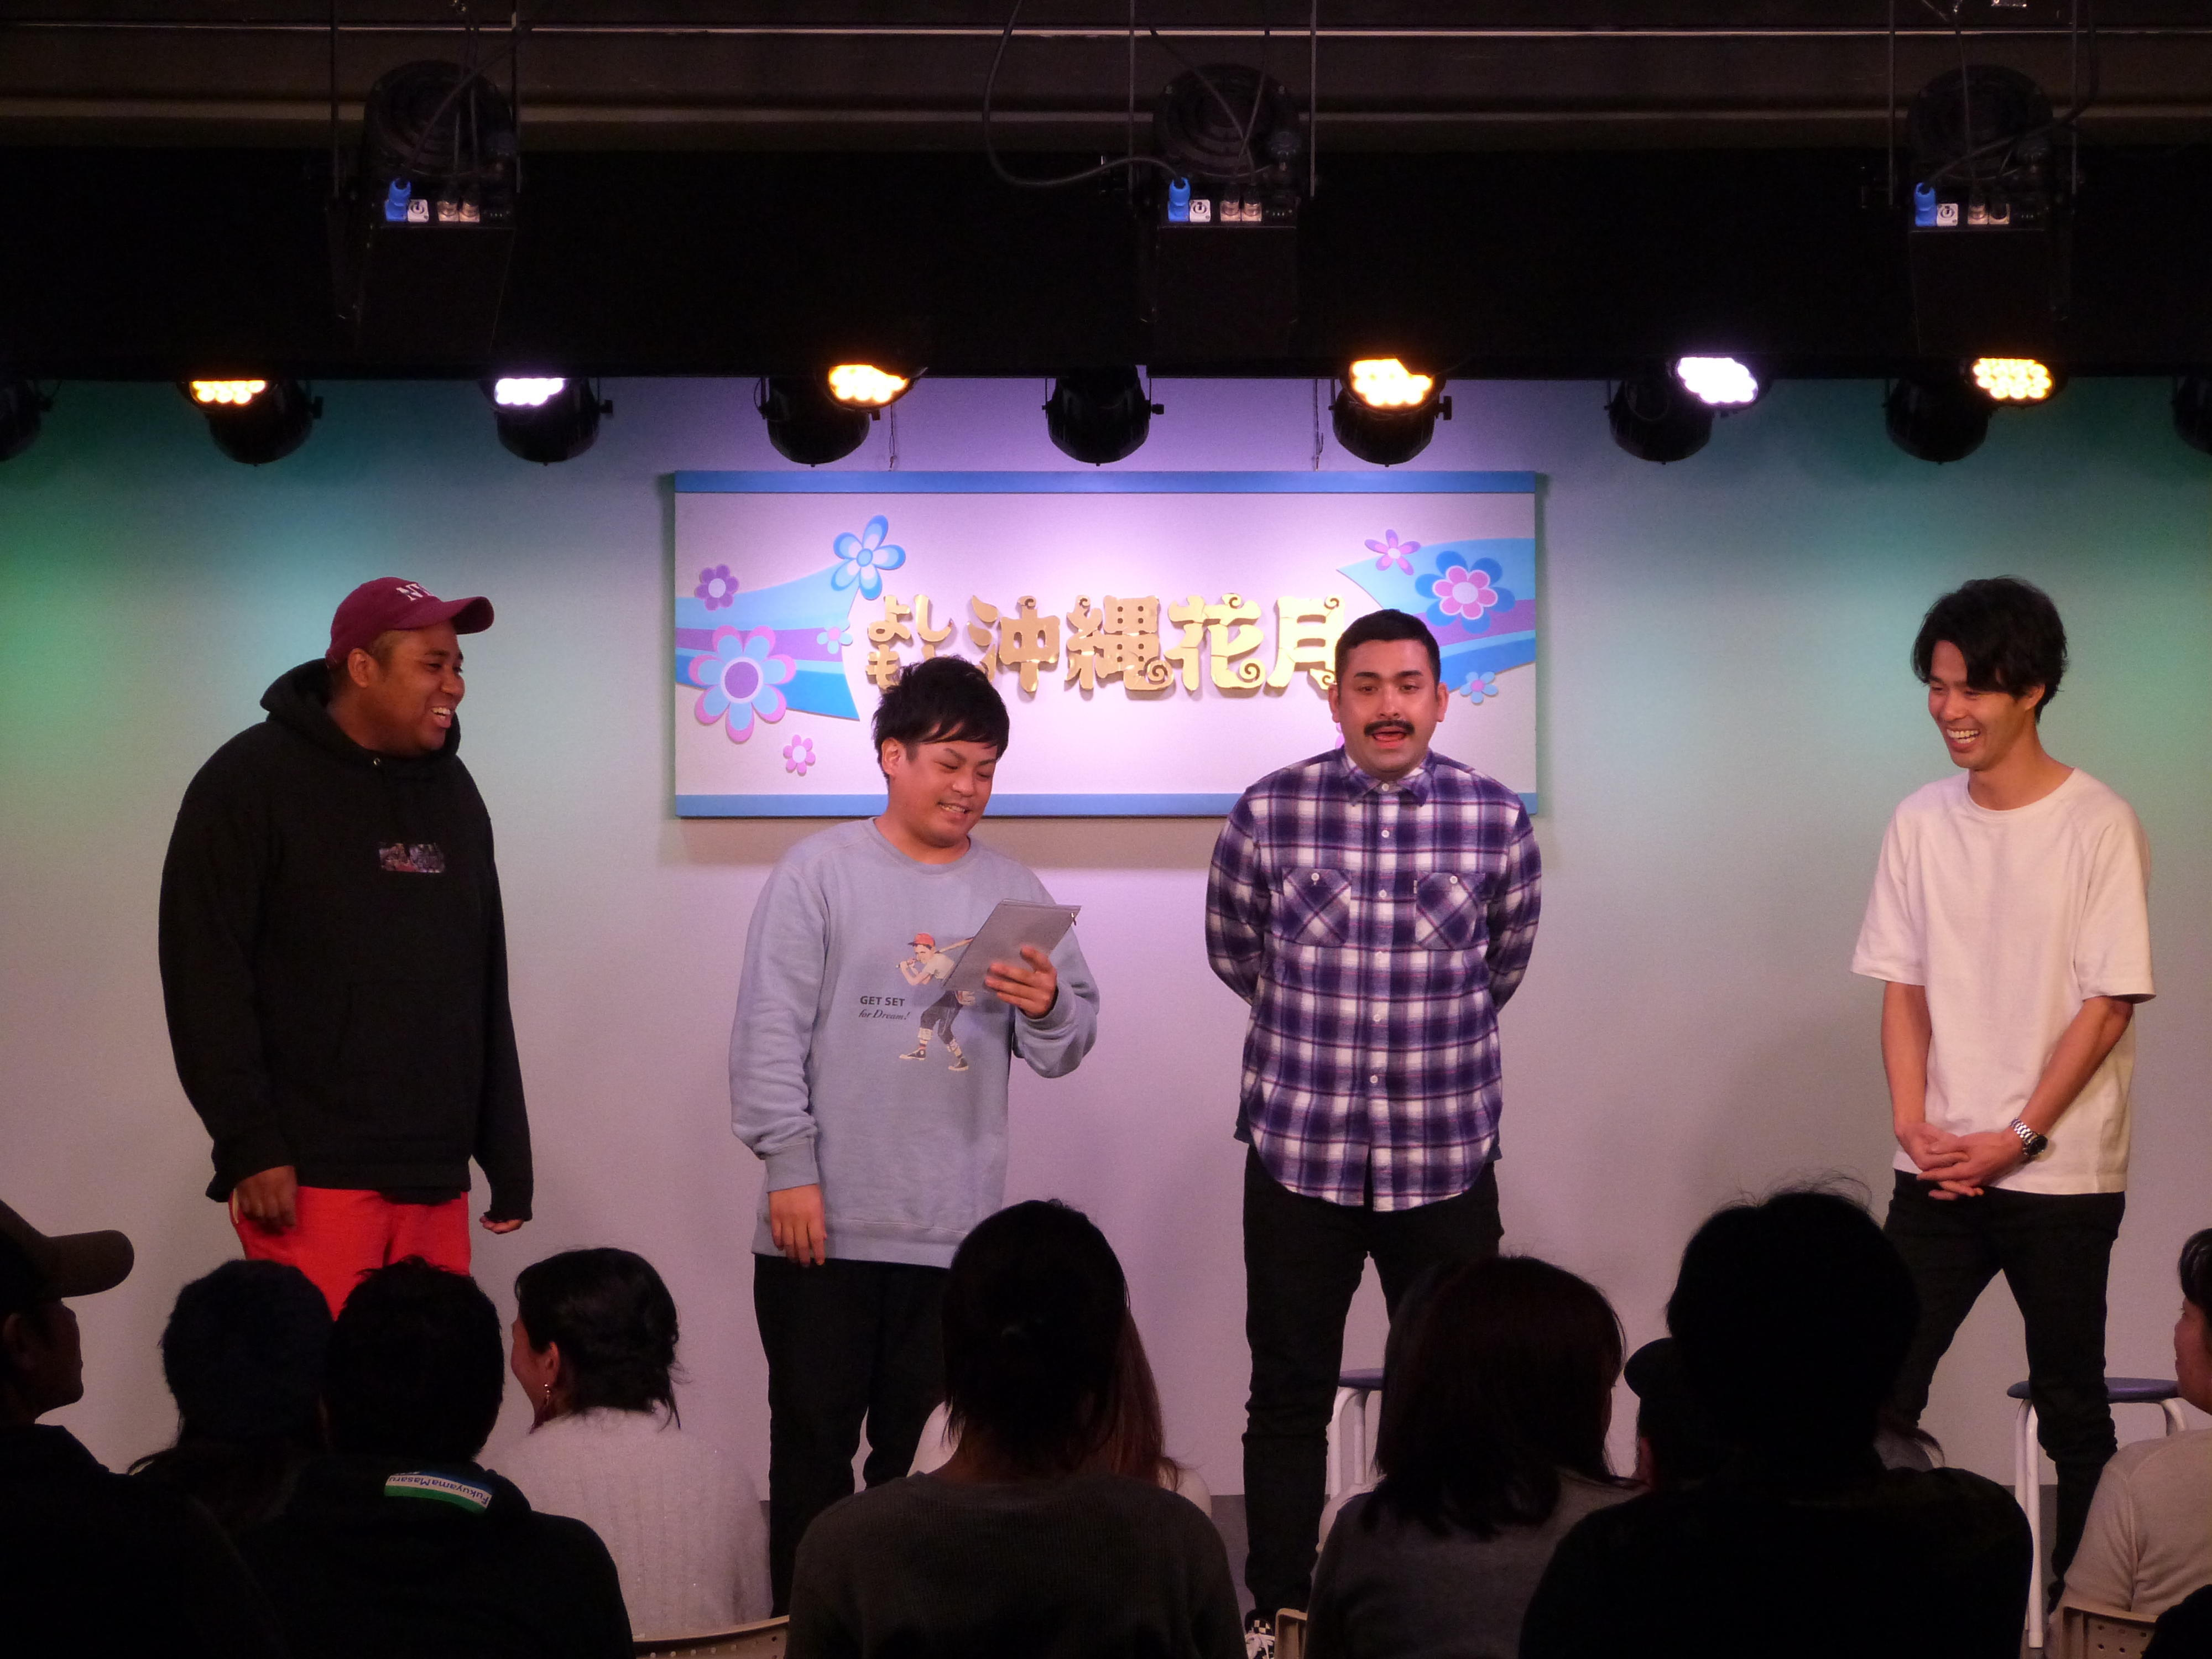 http://news.yoshimoto.co.jp/20180130200218-054e99aefaeab57062ebf49c8f6cc6ce4722ba90.jpg